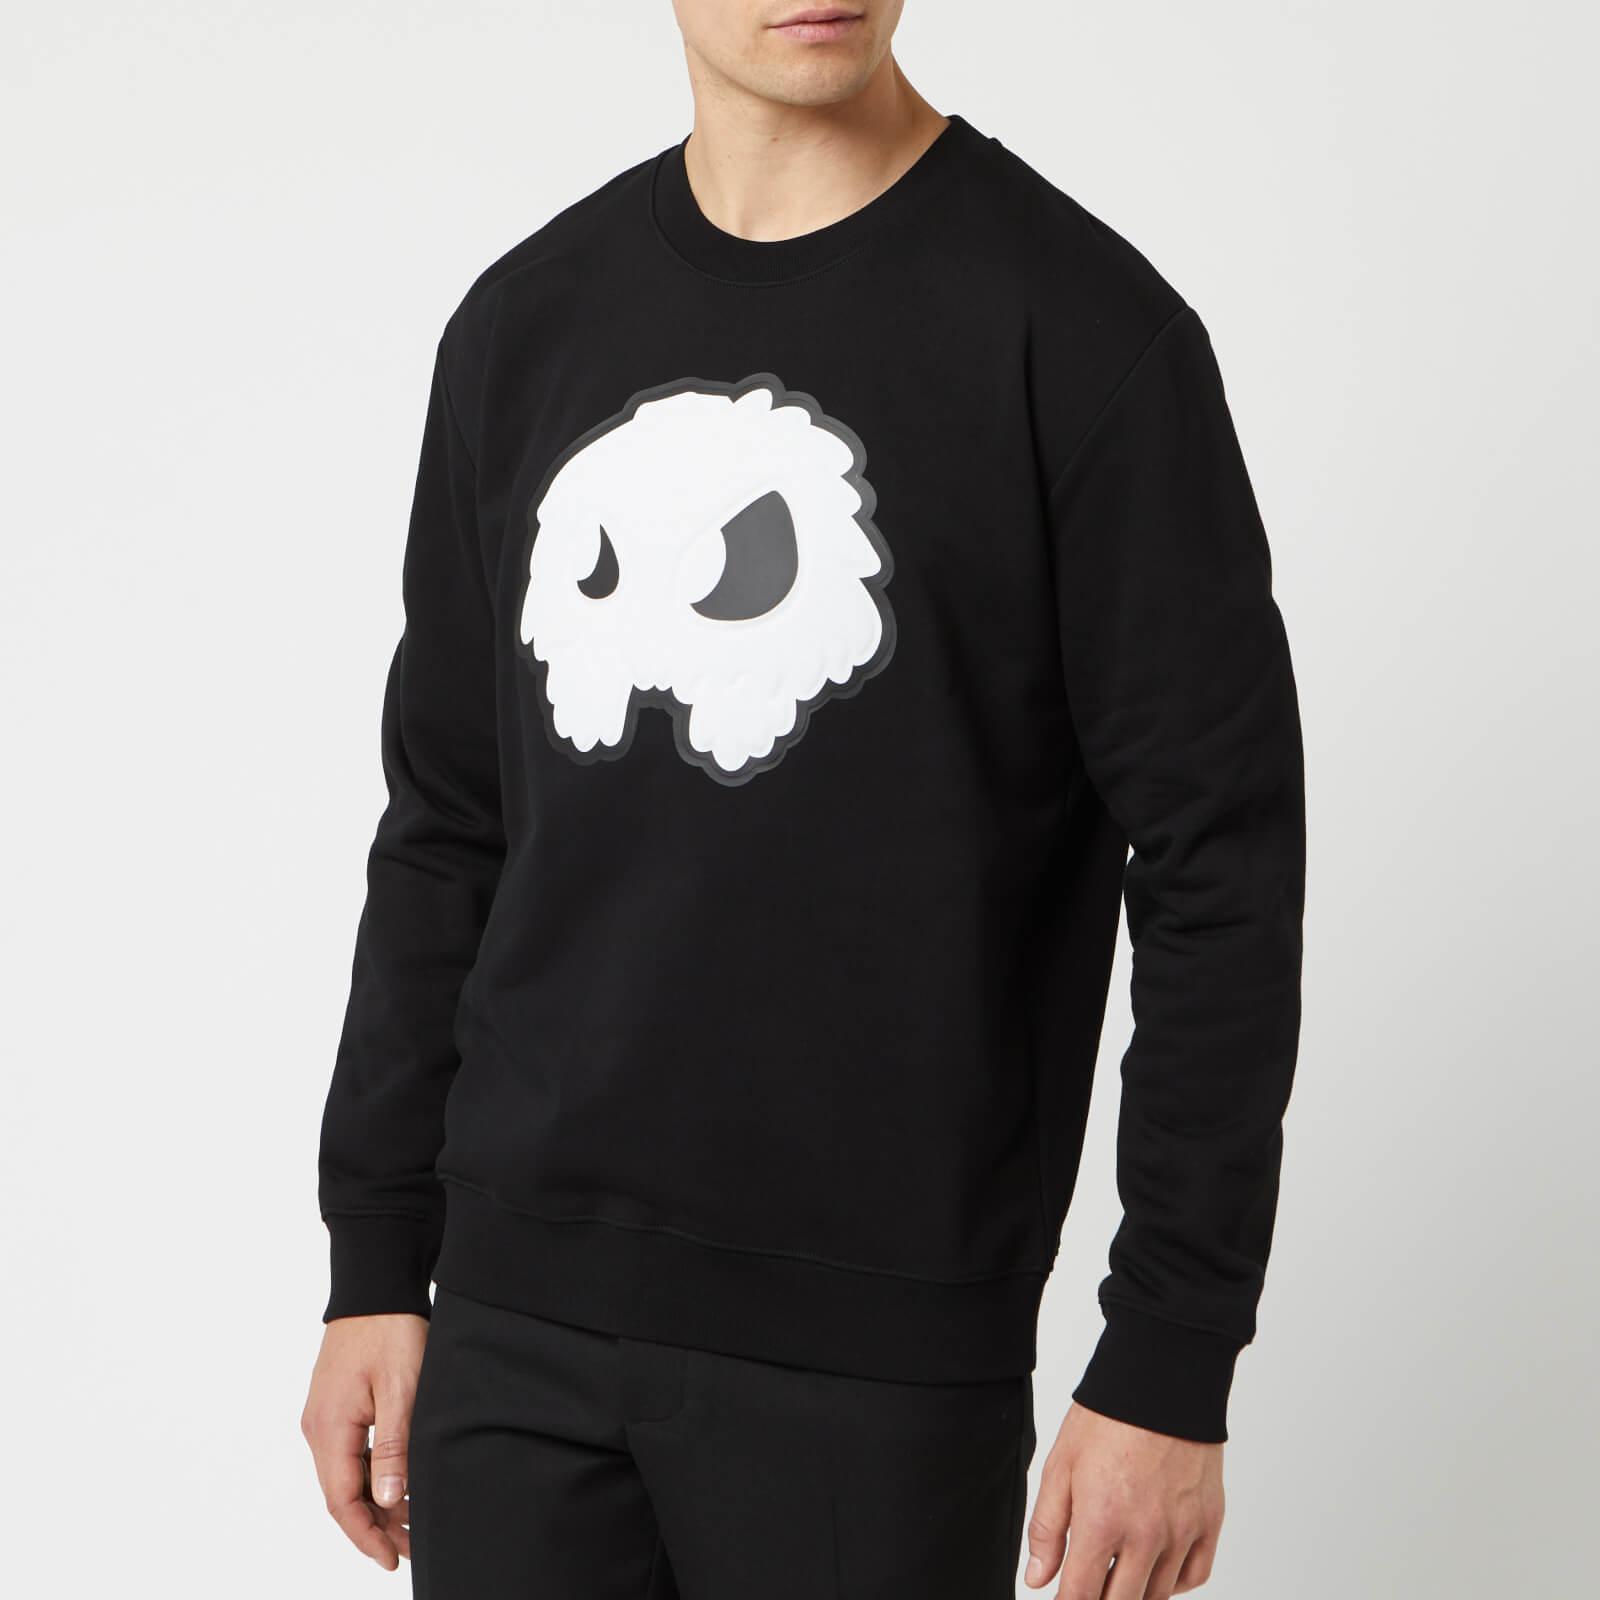 8dd1b0d54eb30 McQ Alexander McQueen Men's Monster Big Crew Neck Sweatshirt - Darkest Black